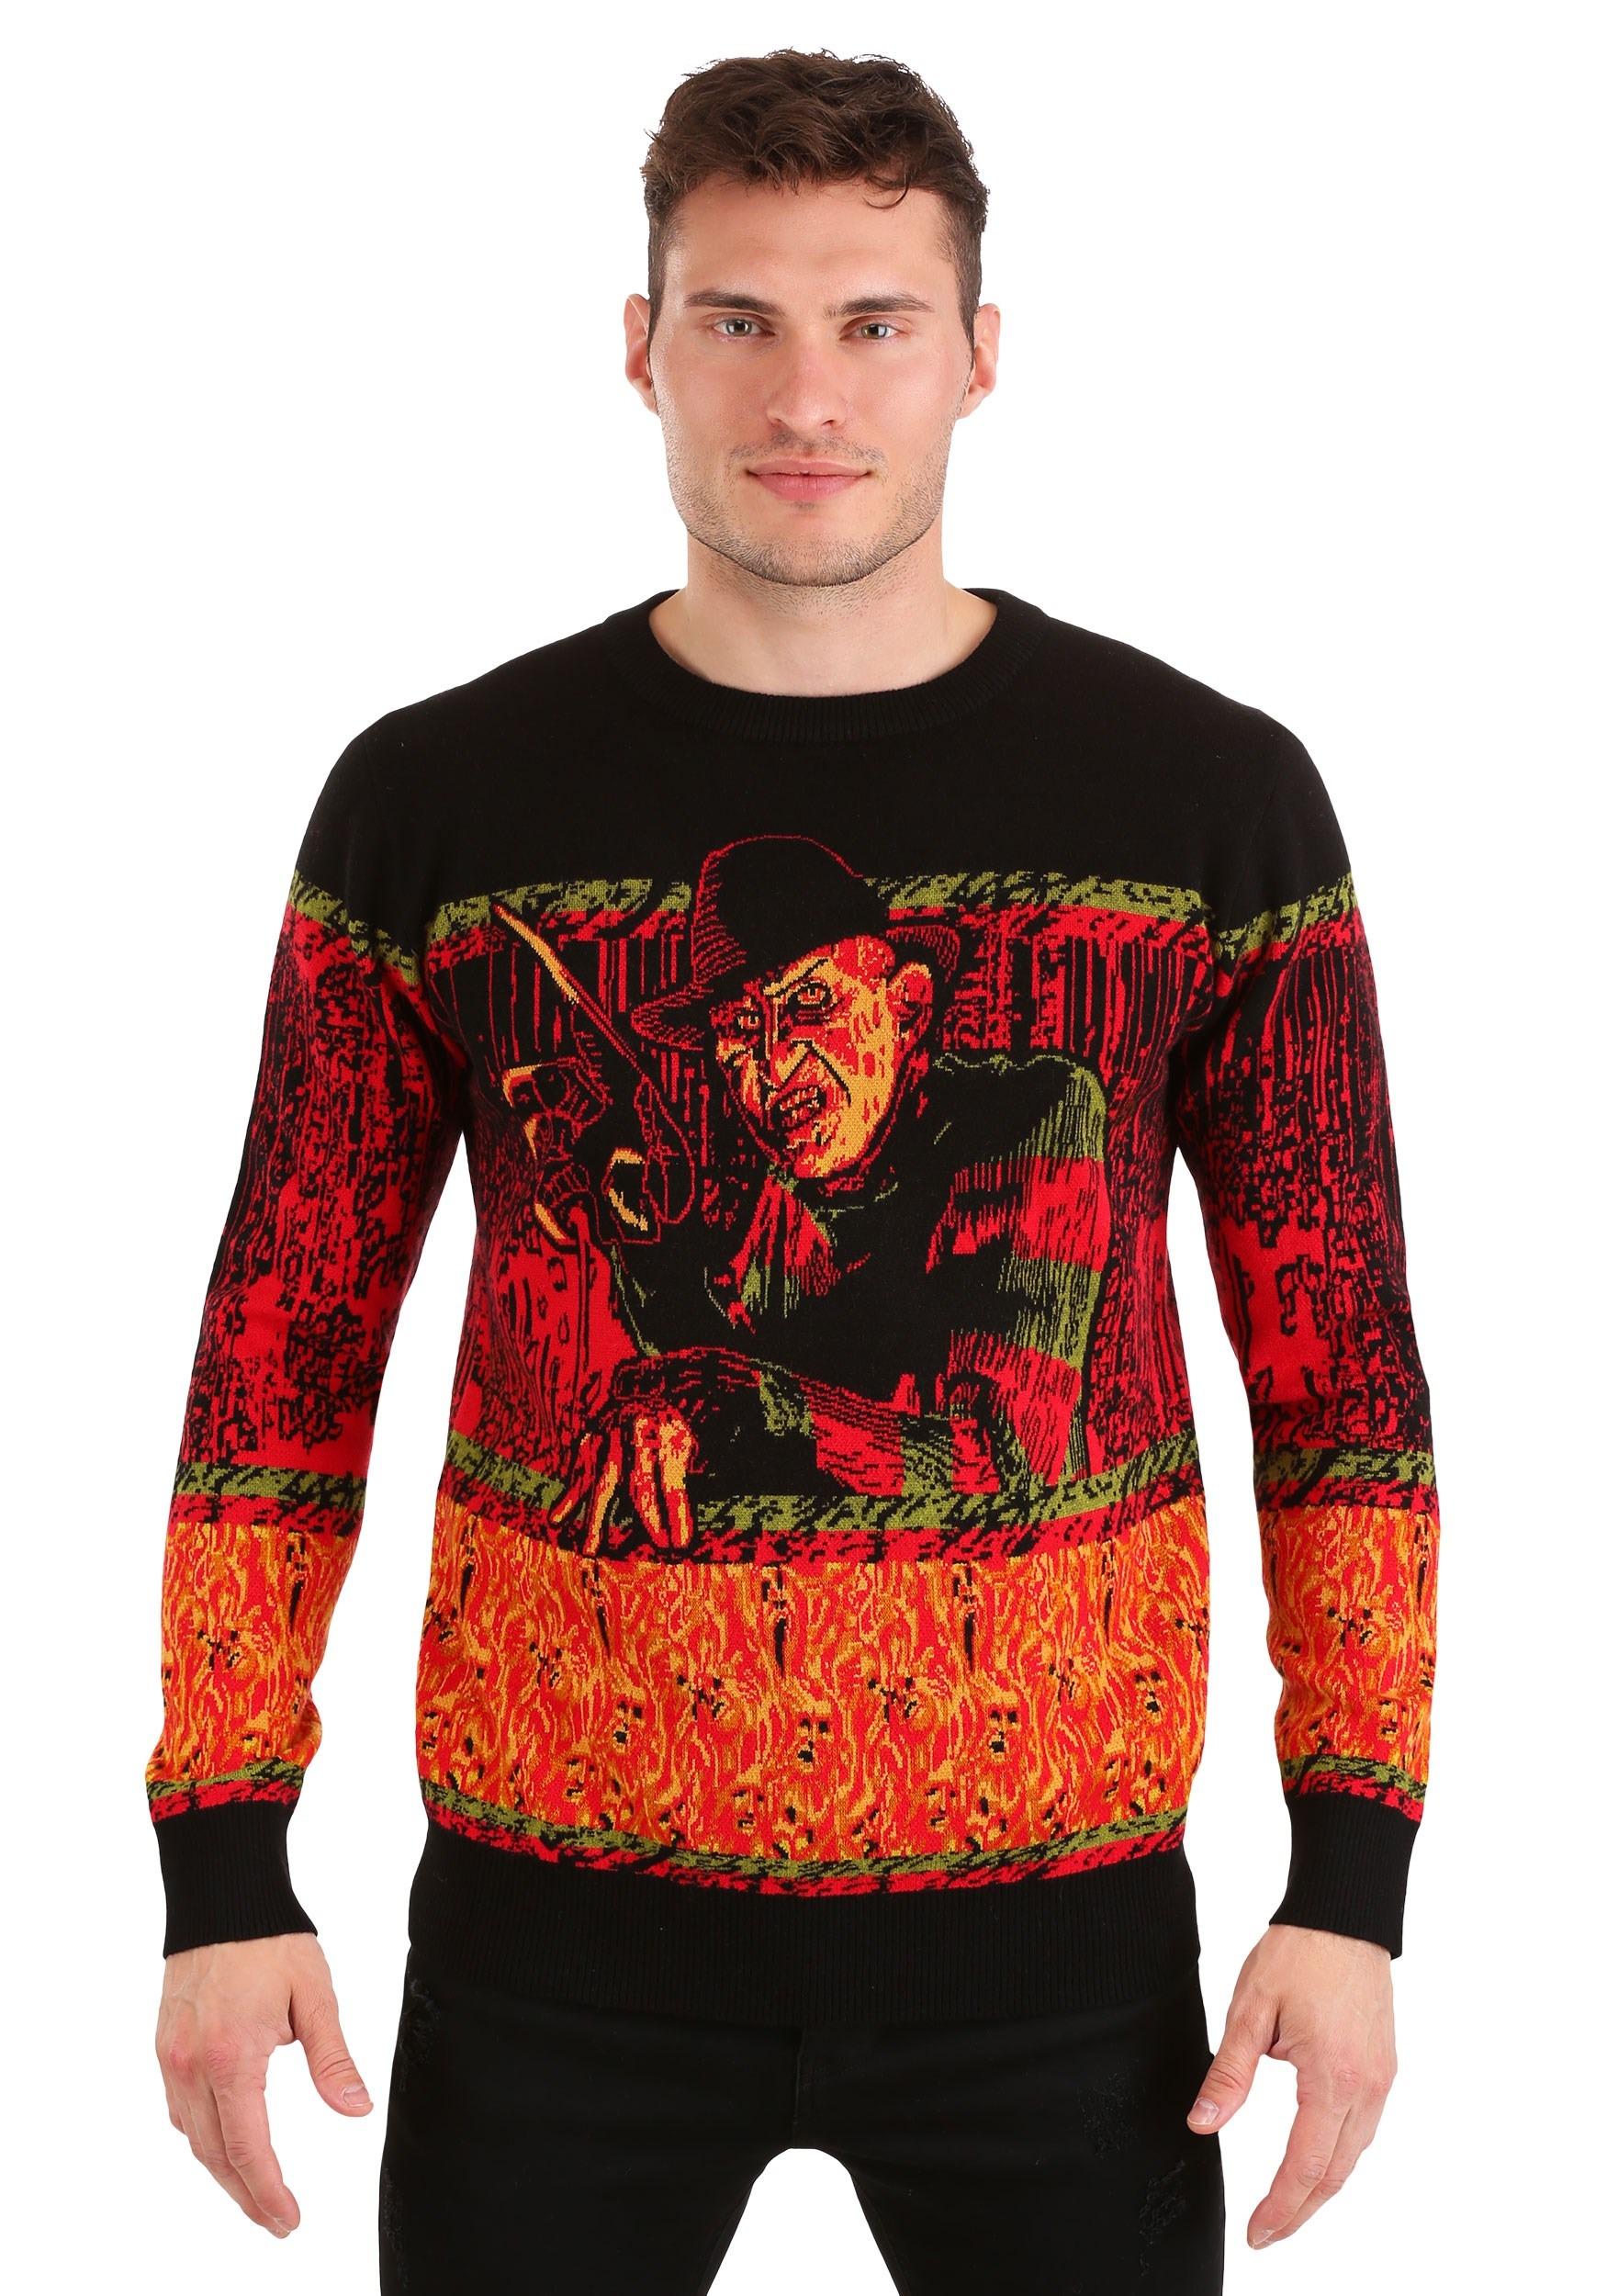 Nightmare on Elm Street Freddy Halloween Sweater for Adults